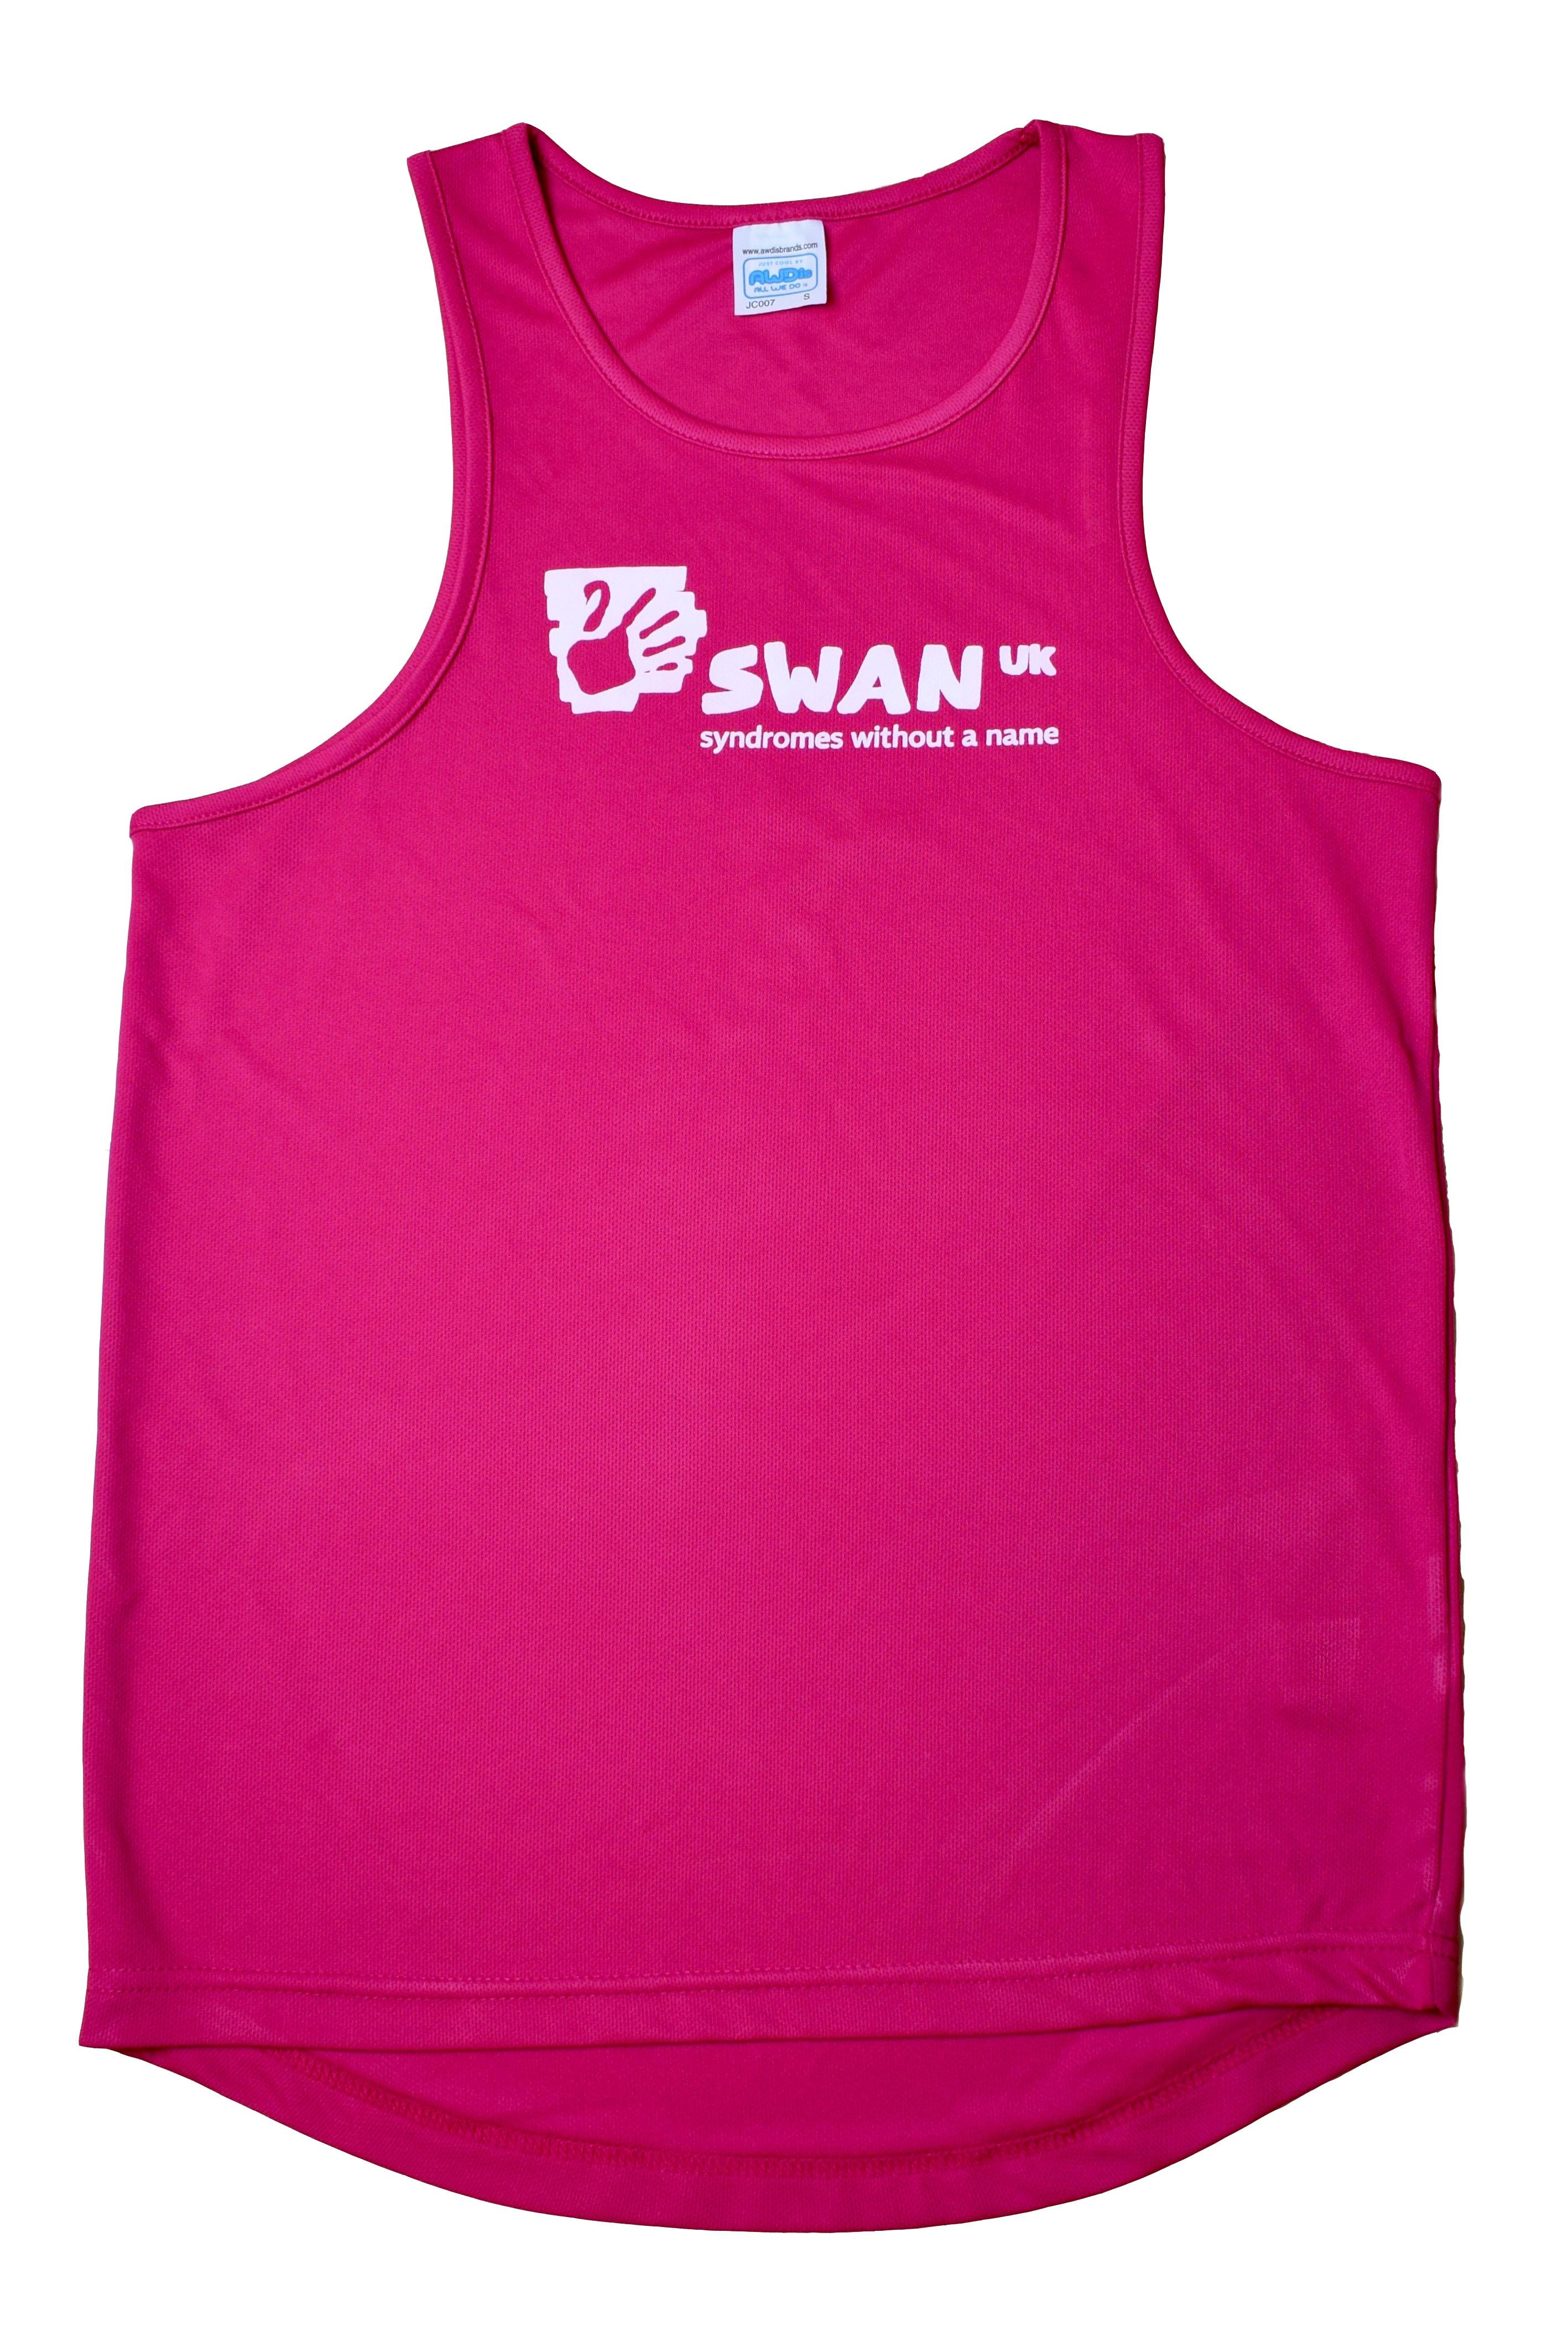 1da9a90d76c0 SWAN UK Running Vest